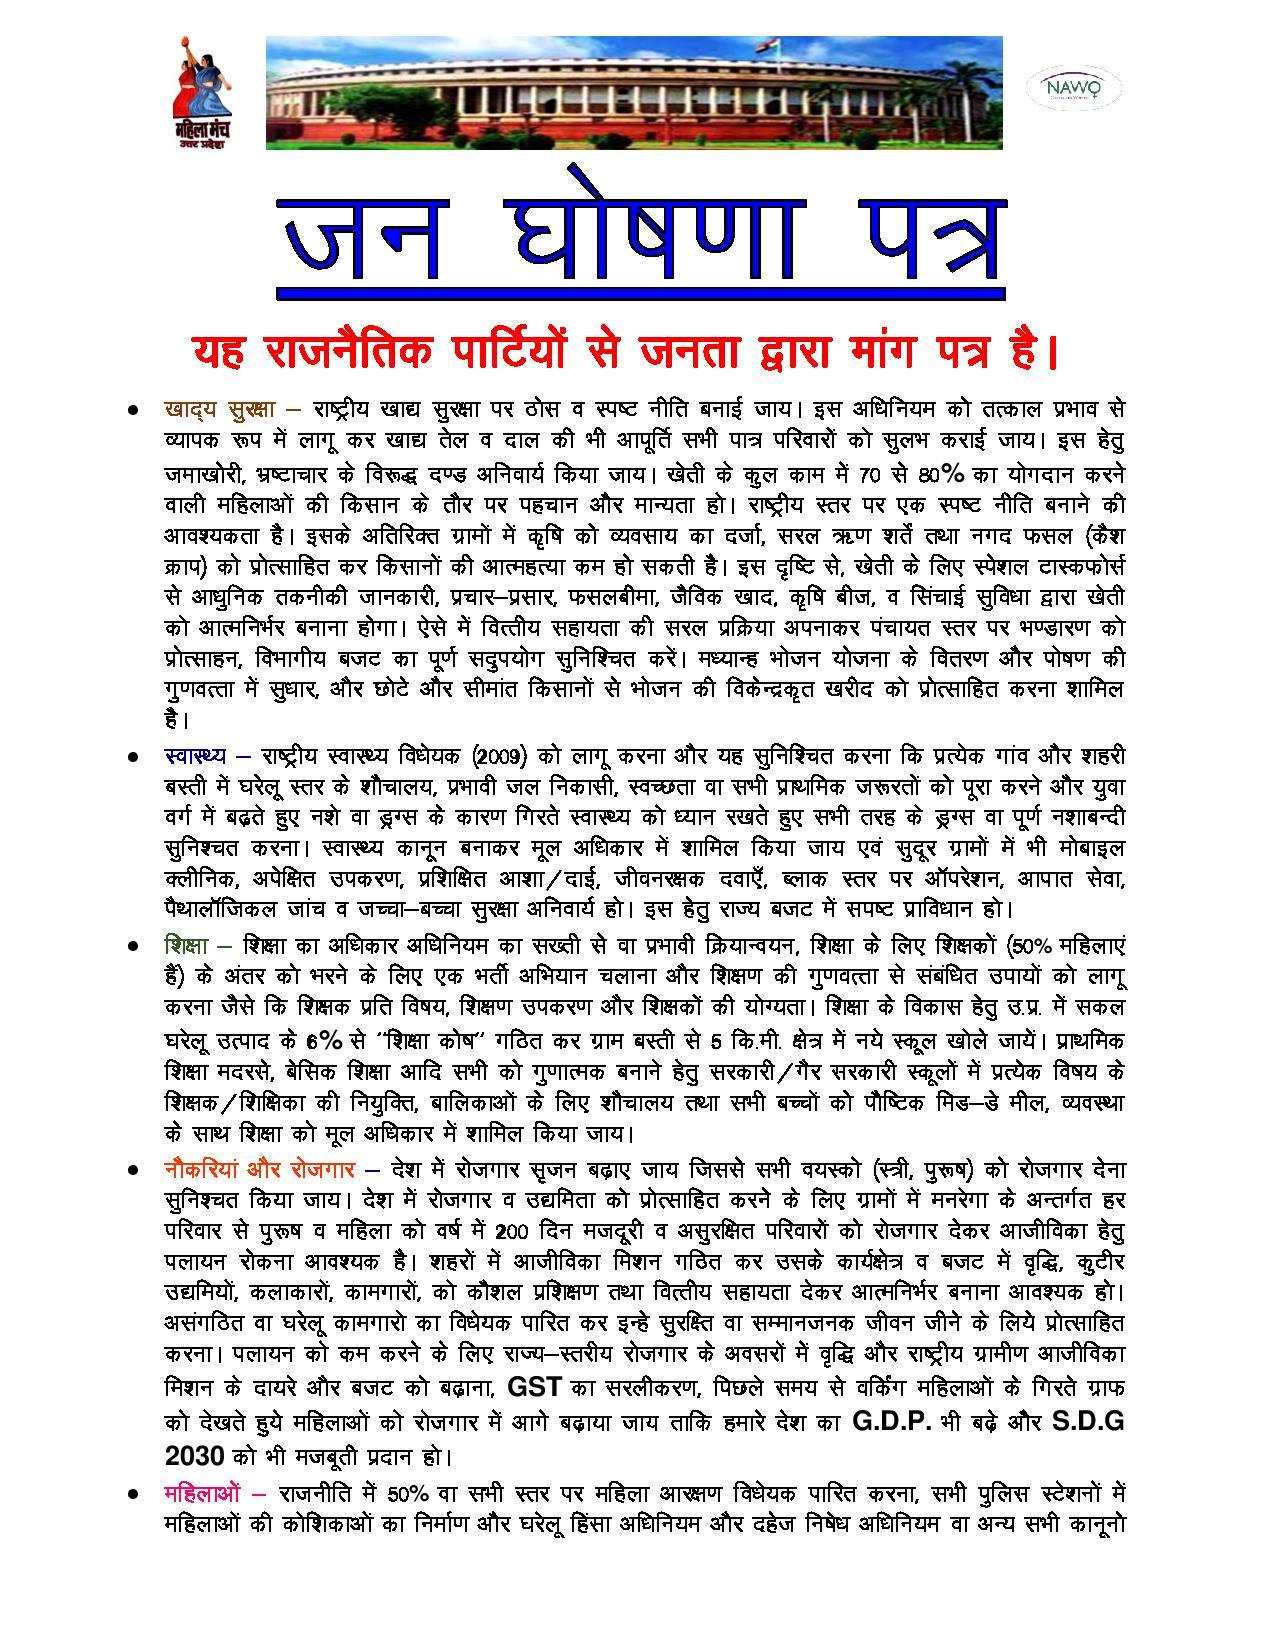 People Manifesto 2019 (Mahila Manch & NAWO) local issues.docx-page-002.jpg